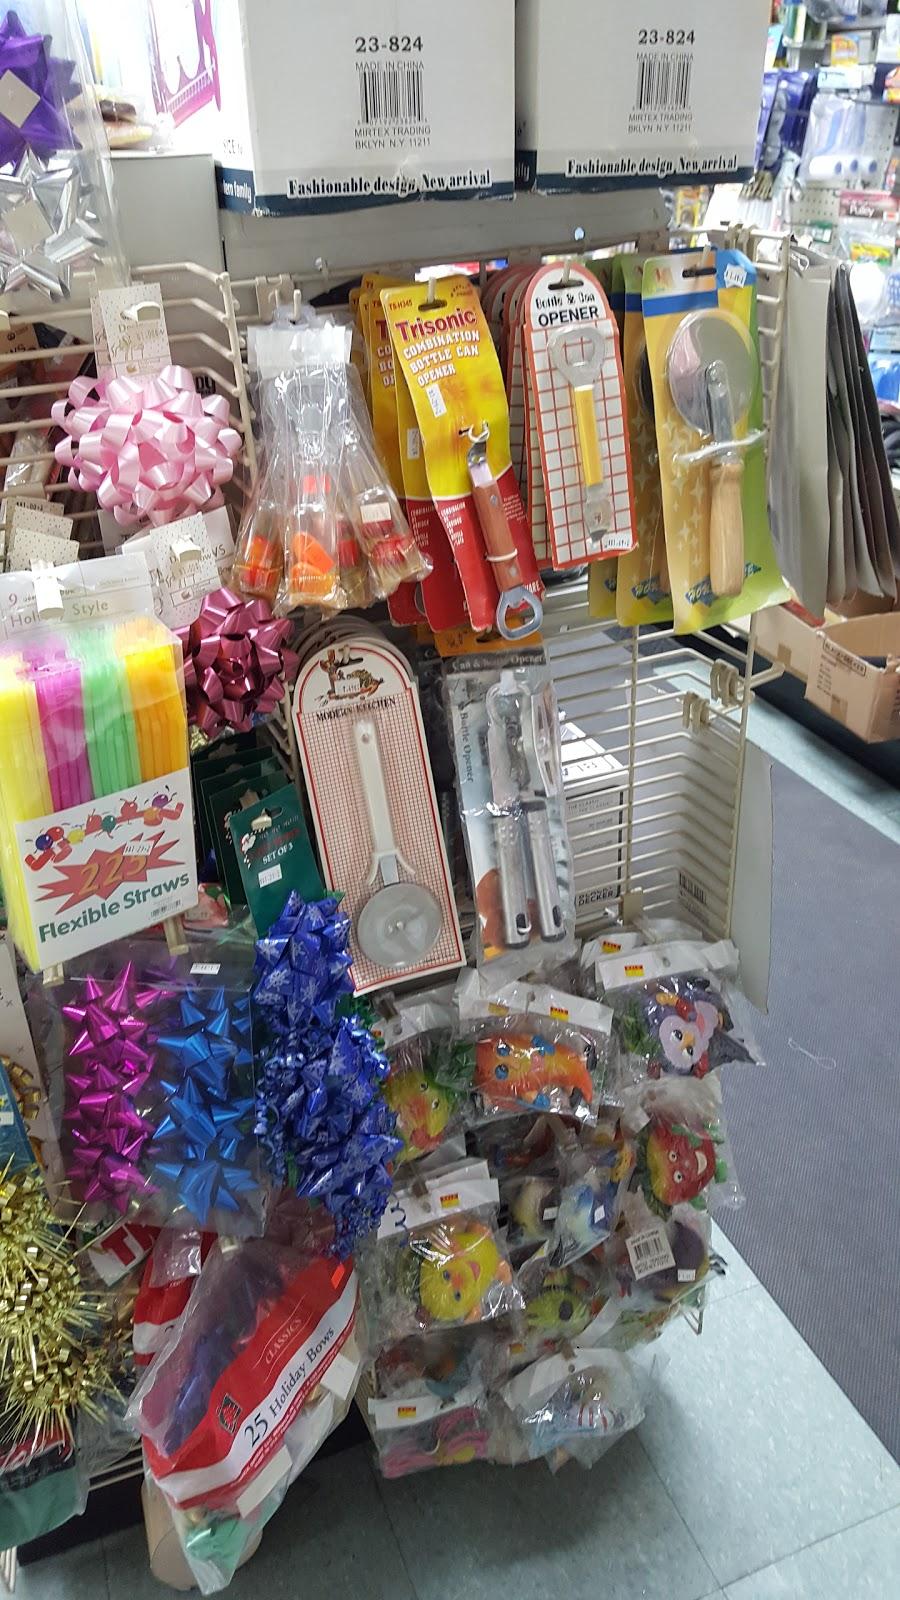 Sunrise Convenience Store - convenience store    Photo 5 of 10   Address: 6905 Bergenline Ave, Guttenberg, NJ 07093, USA   Phone: (201) 854-4324